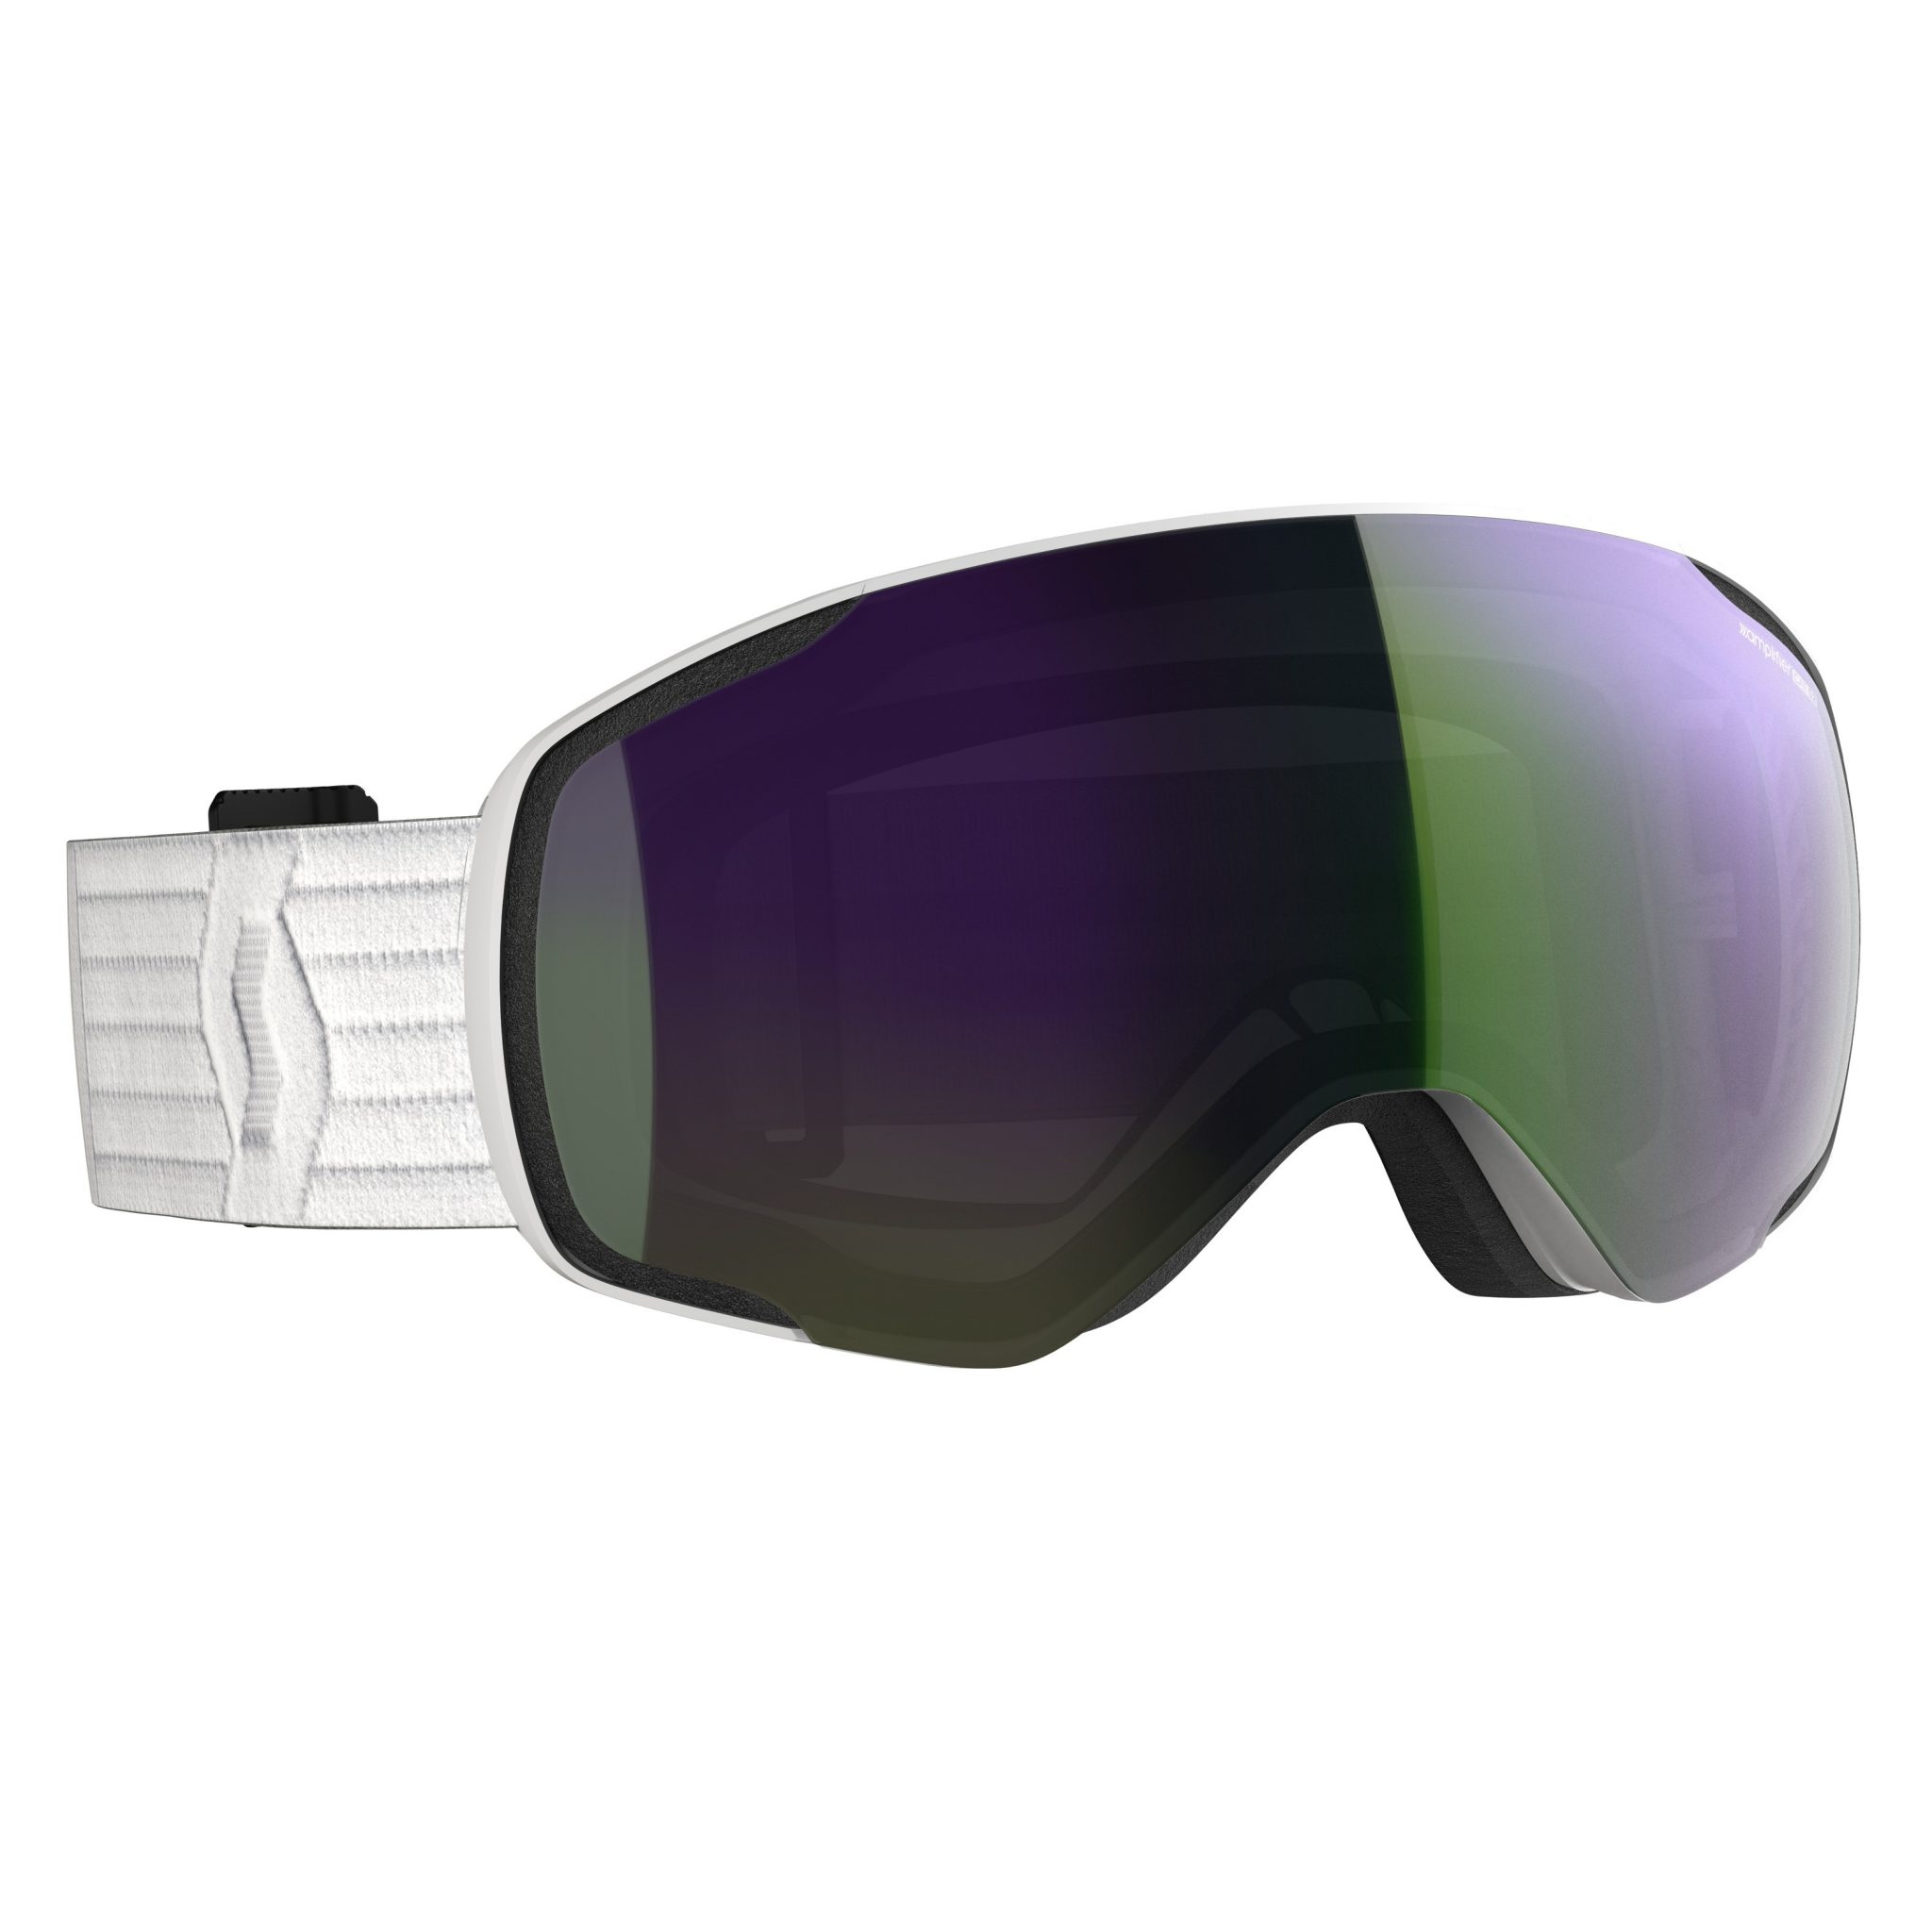 Scott Vapor Goggle - White Enhancer Green Chrome - Front View